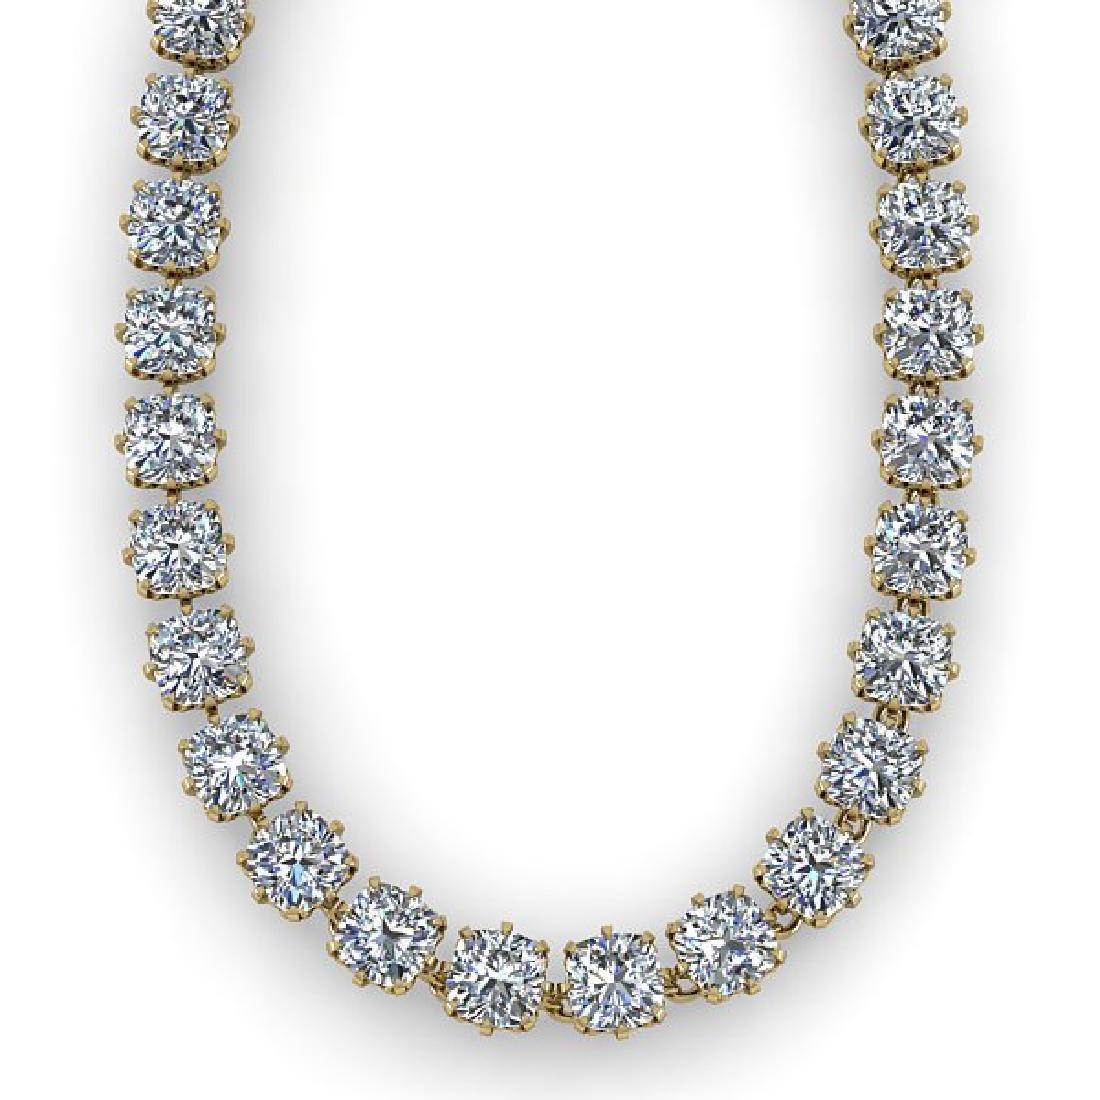 28 CTW Oval Cut SI Certified Diamond Necklace 14K - 2